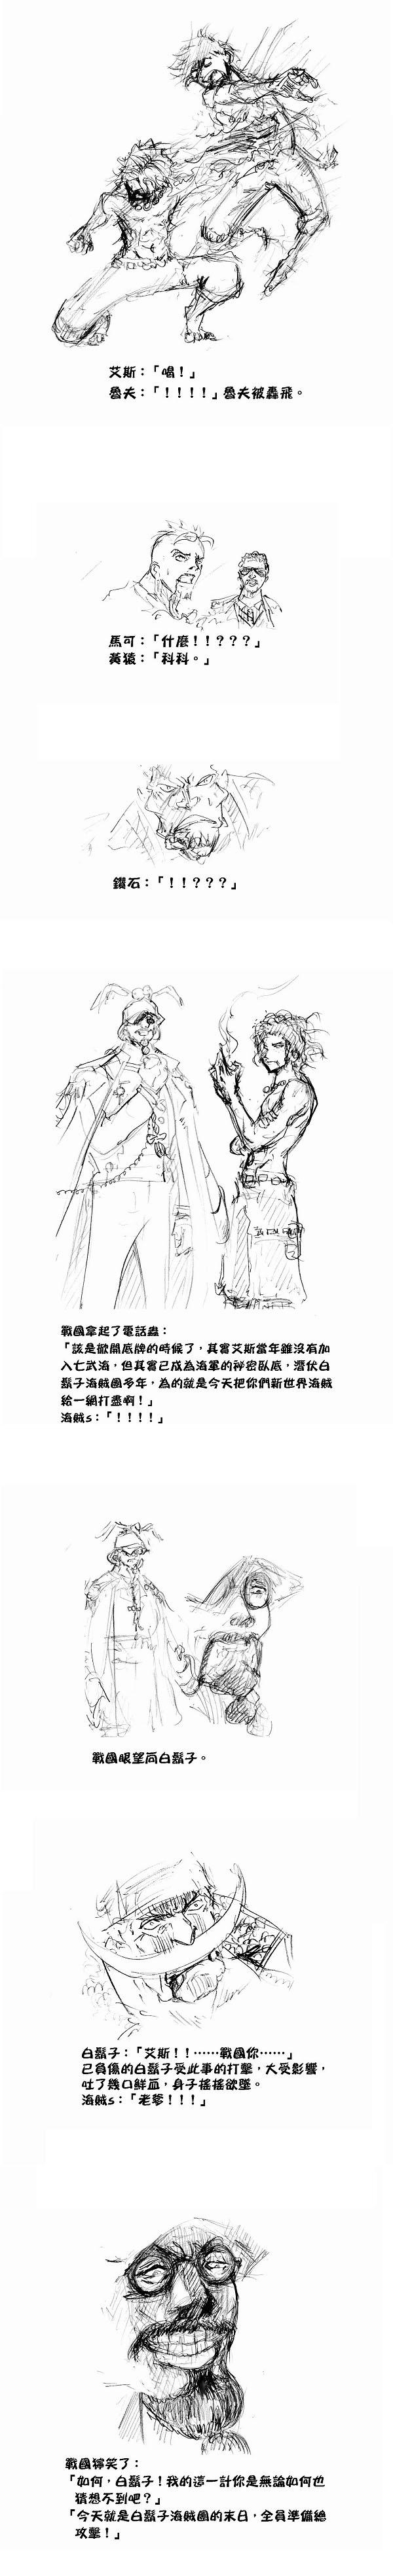 OP囧賊王:計中計中計-2